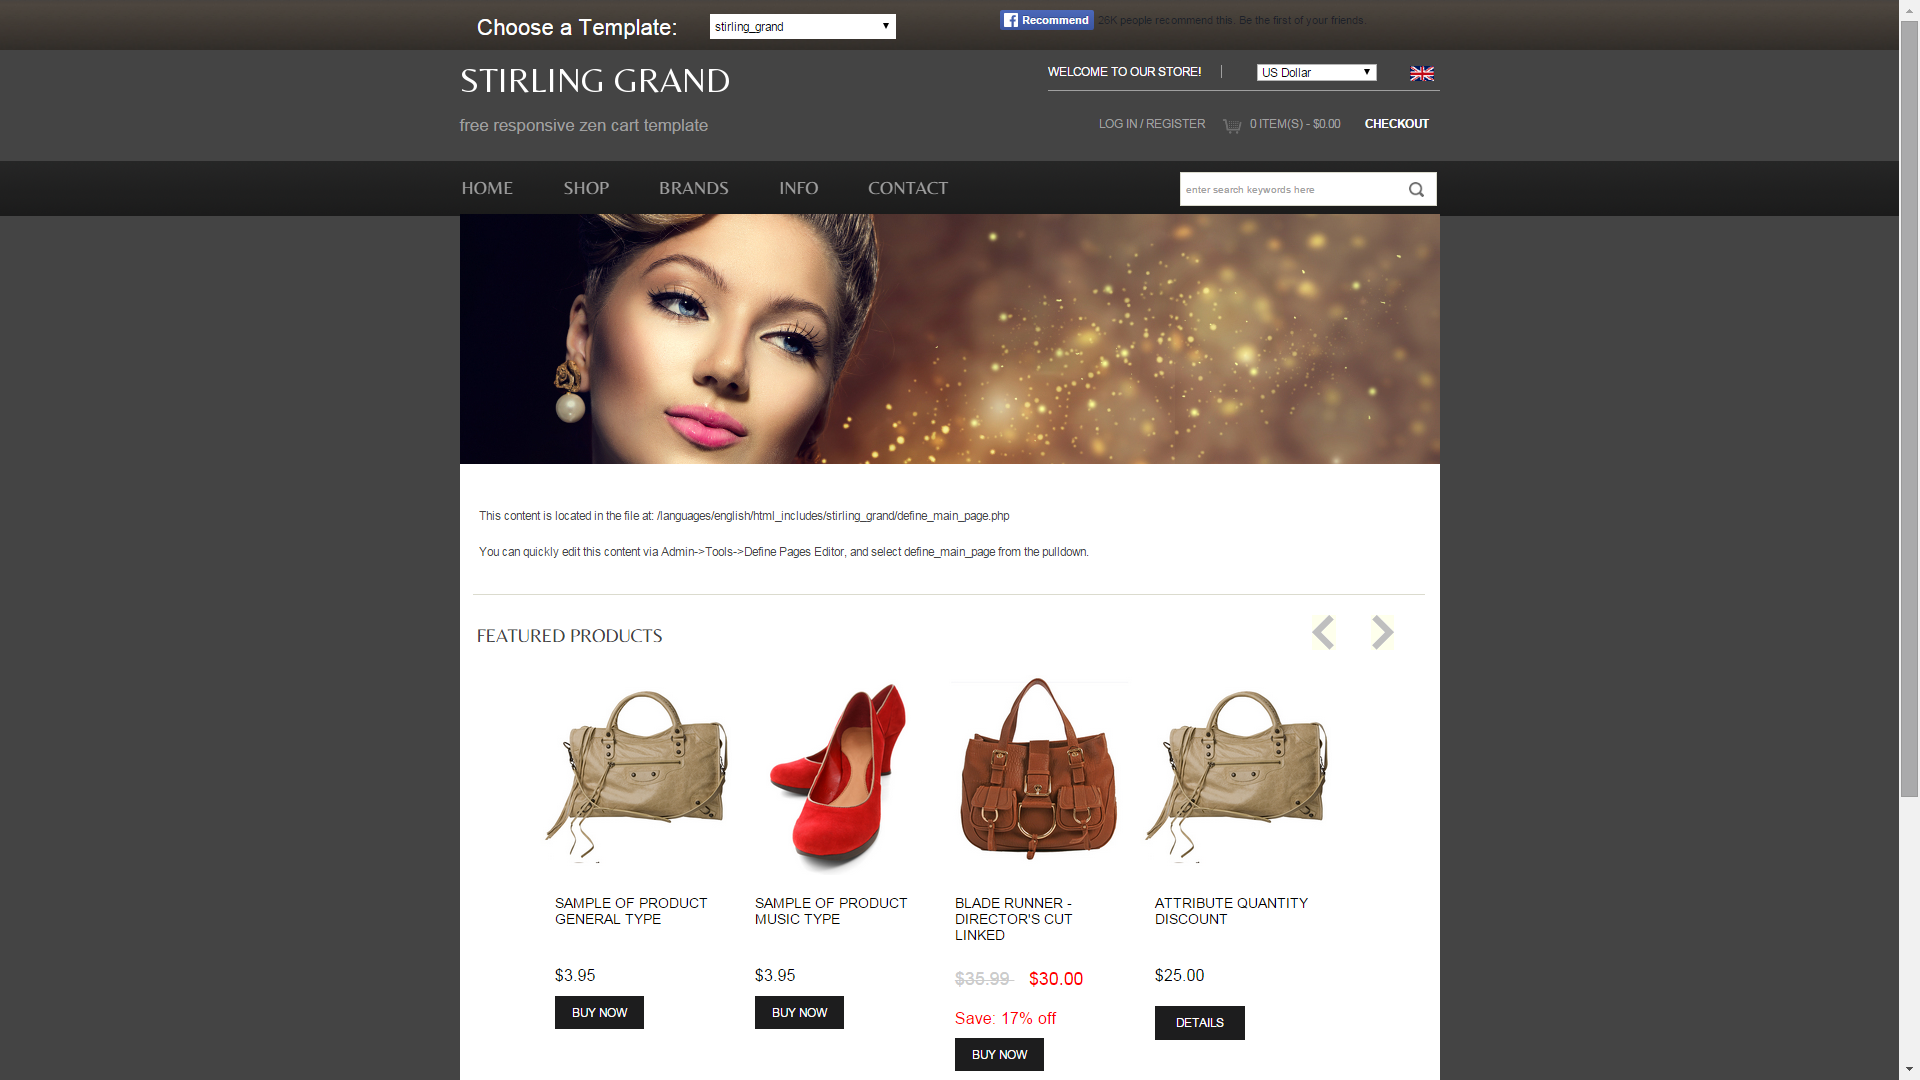 Screenshot of Stirling Grand e-commerce template for ZenCart